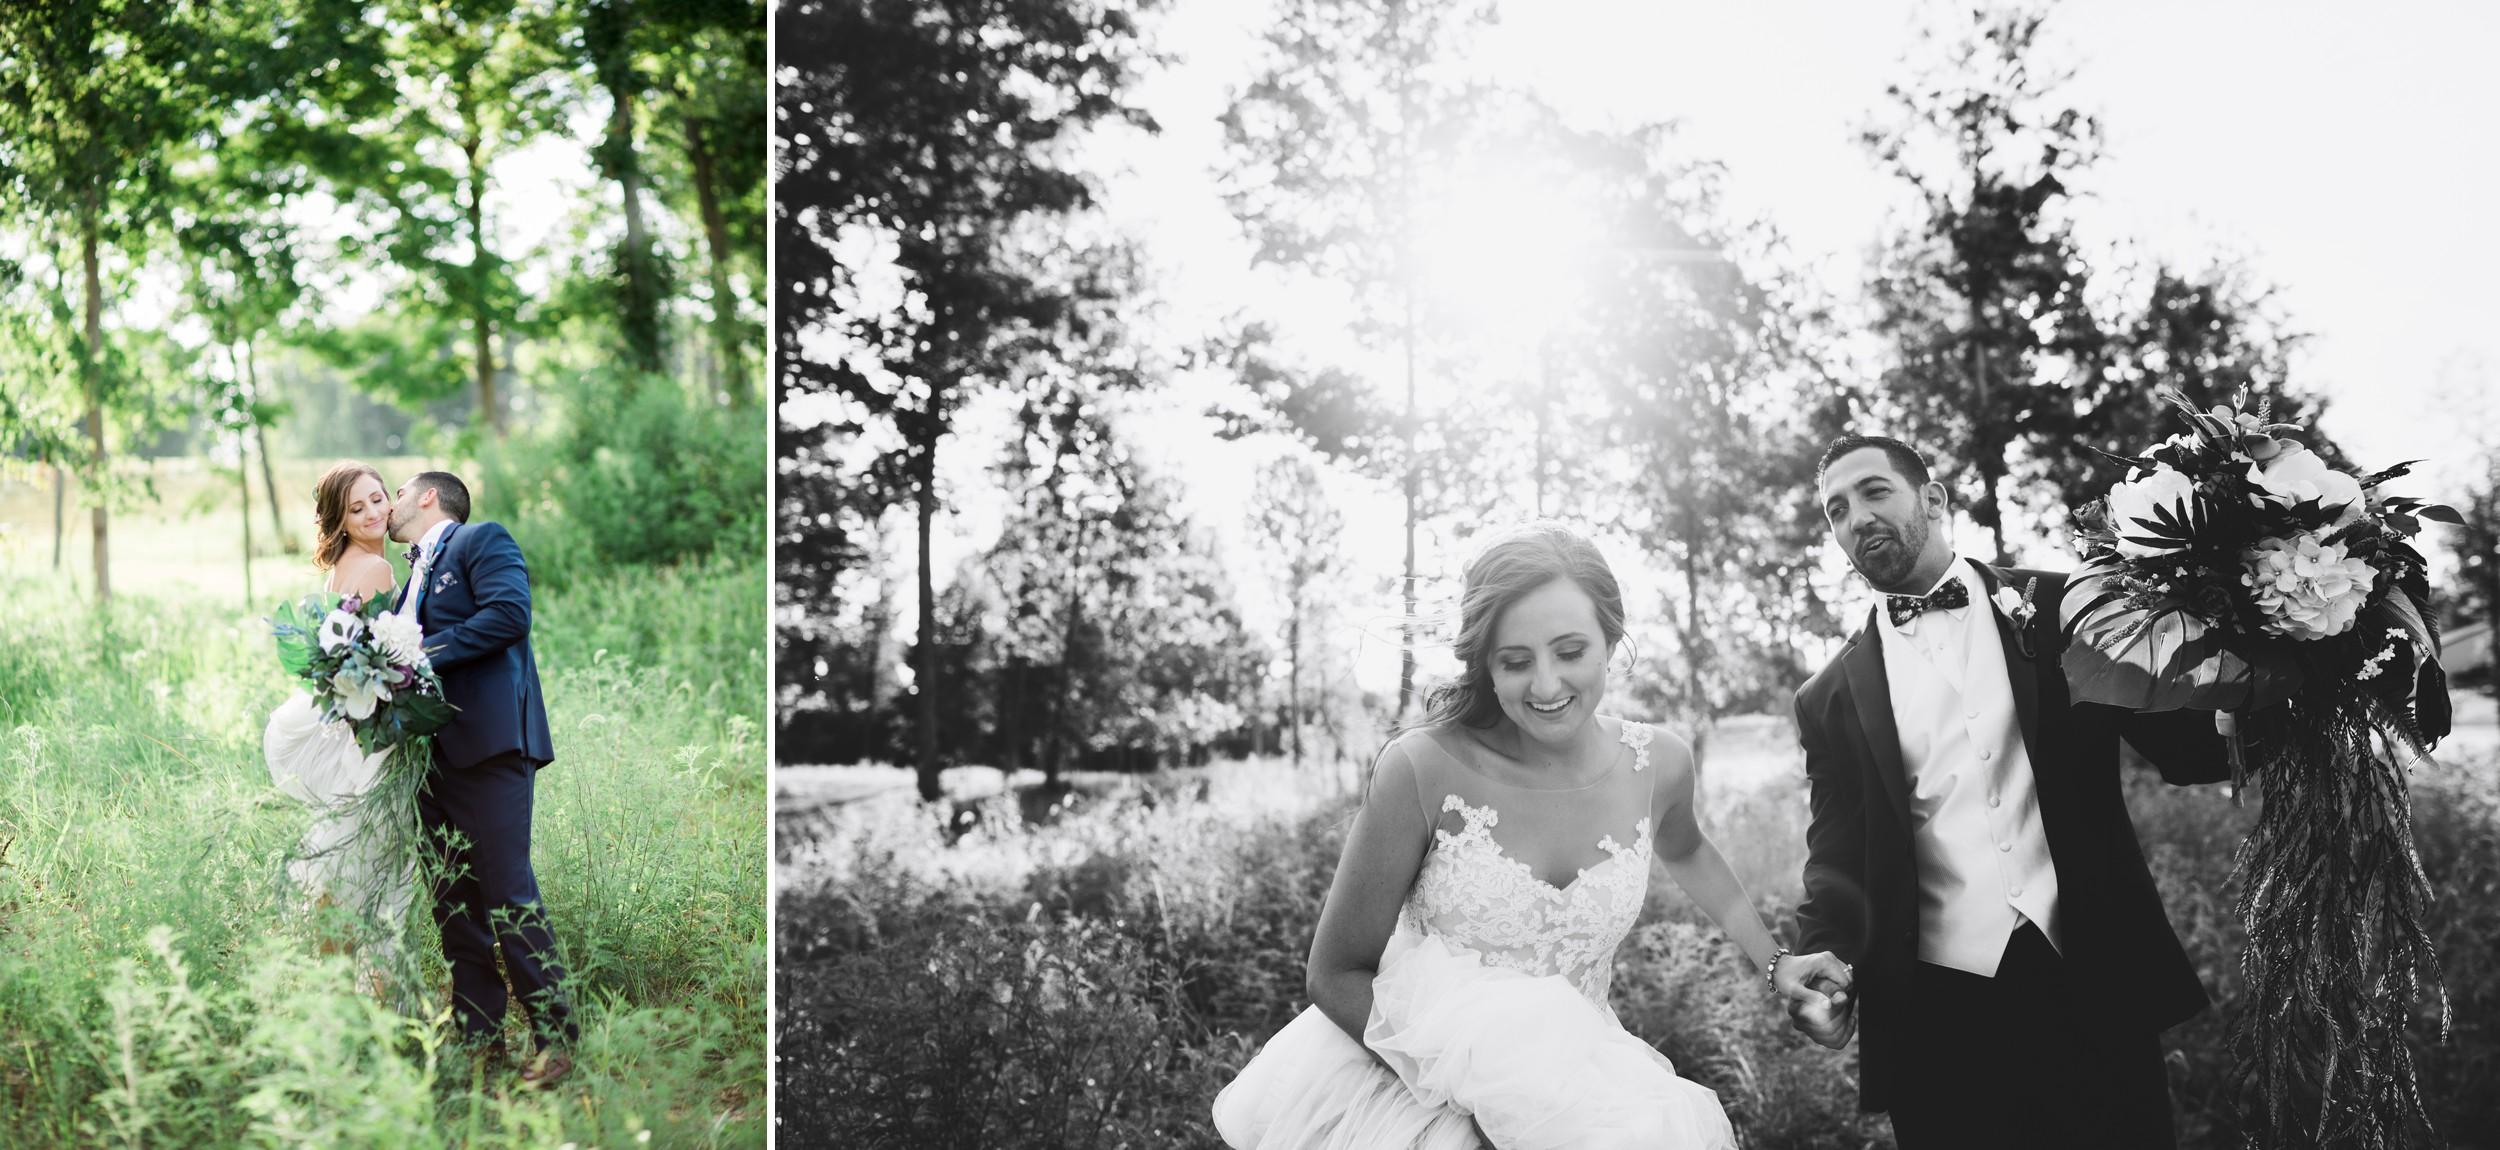 Nick-and-martina-pinelake-vinyards-wedding-columbiana-ohio-tracylynn-photography 13.jpg